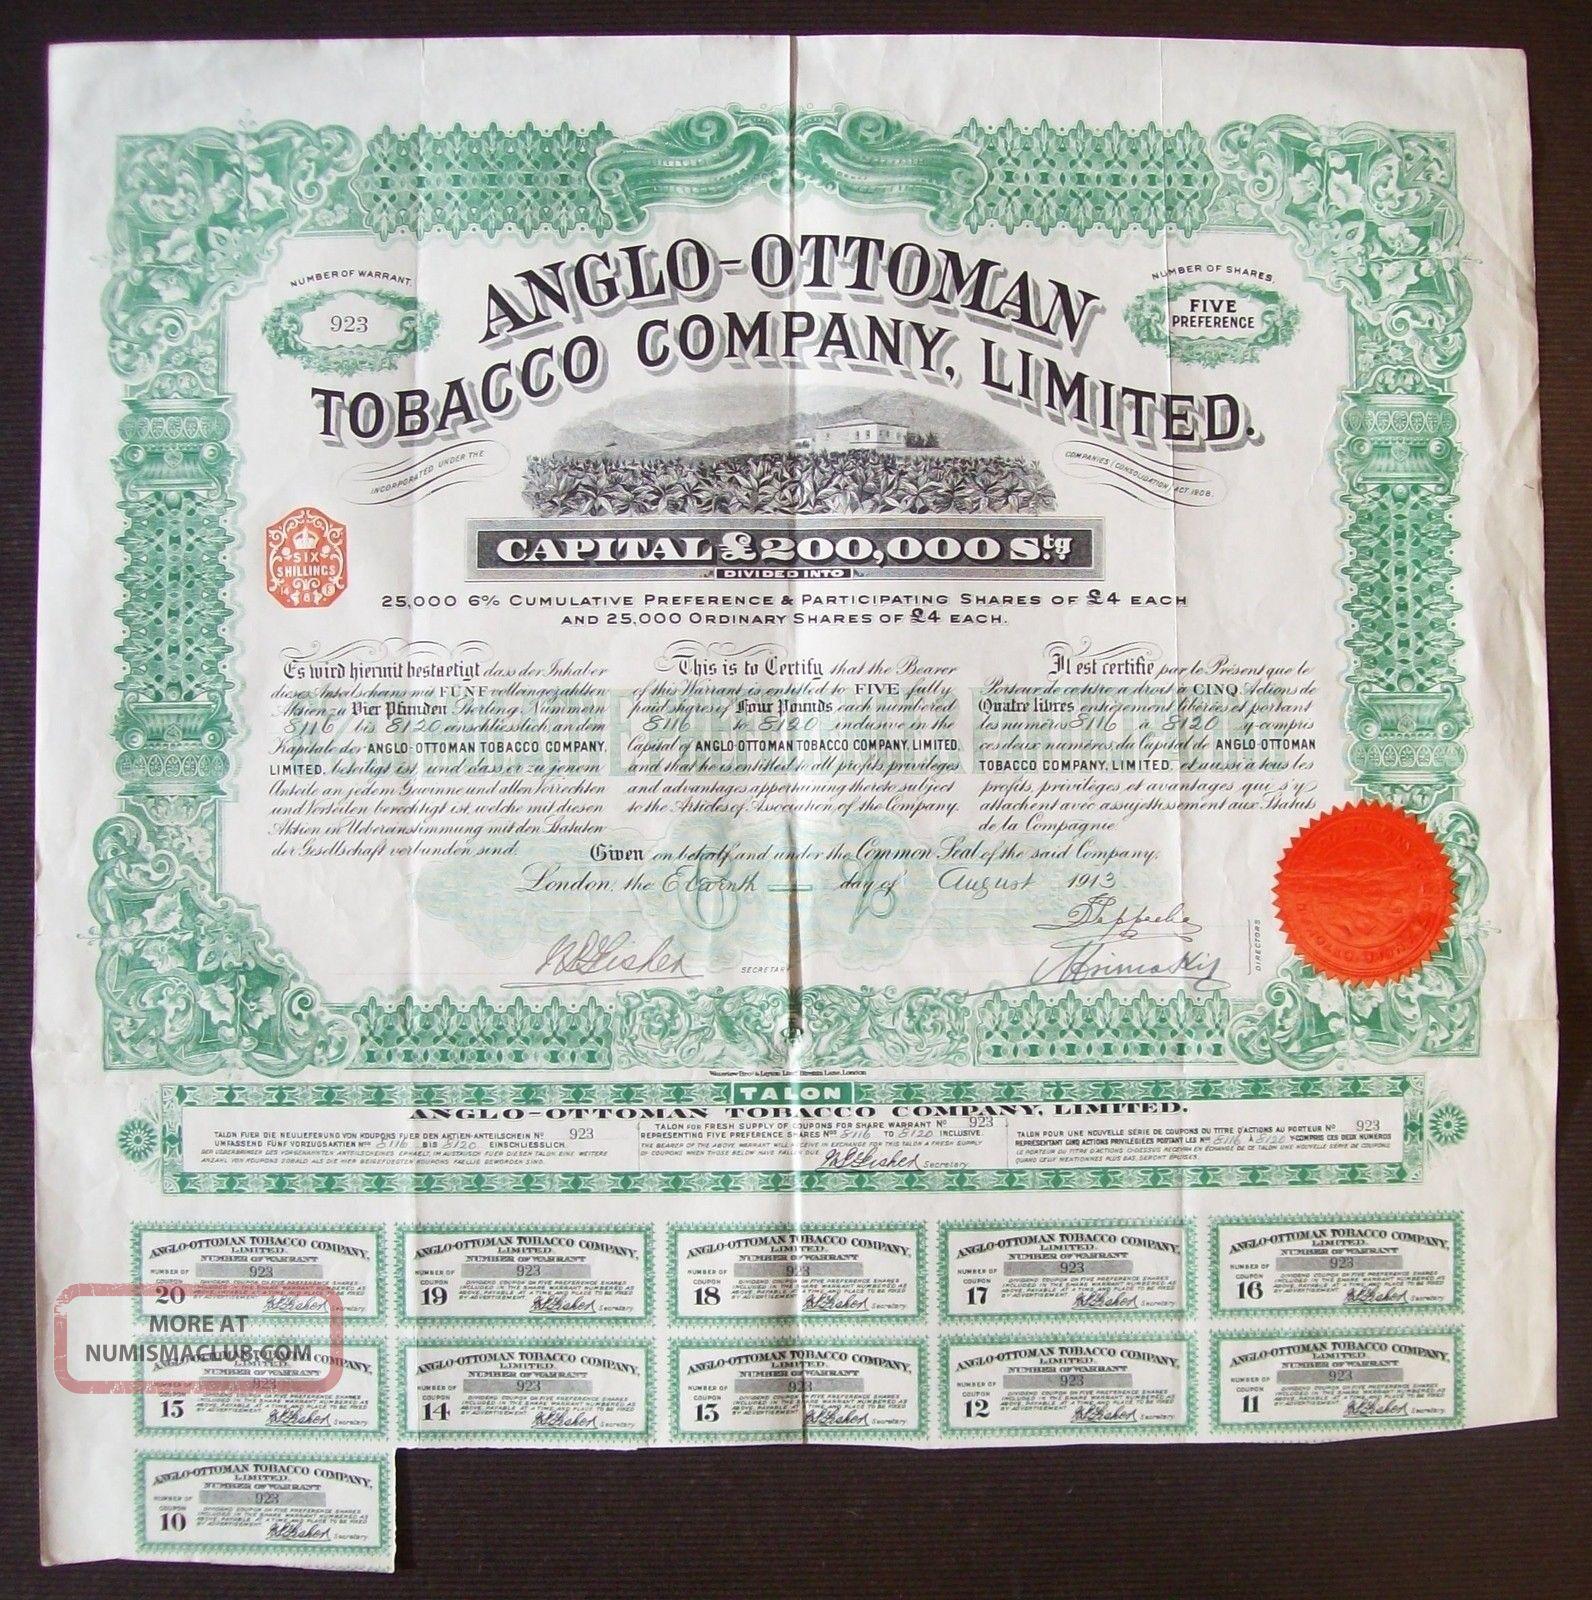 Gb England 1913 Illustrated Bond Anglo - Ottoman Tobacco Co.  Ltd - Tabac.  R4051 World photo